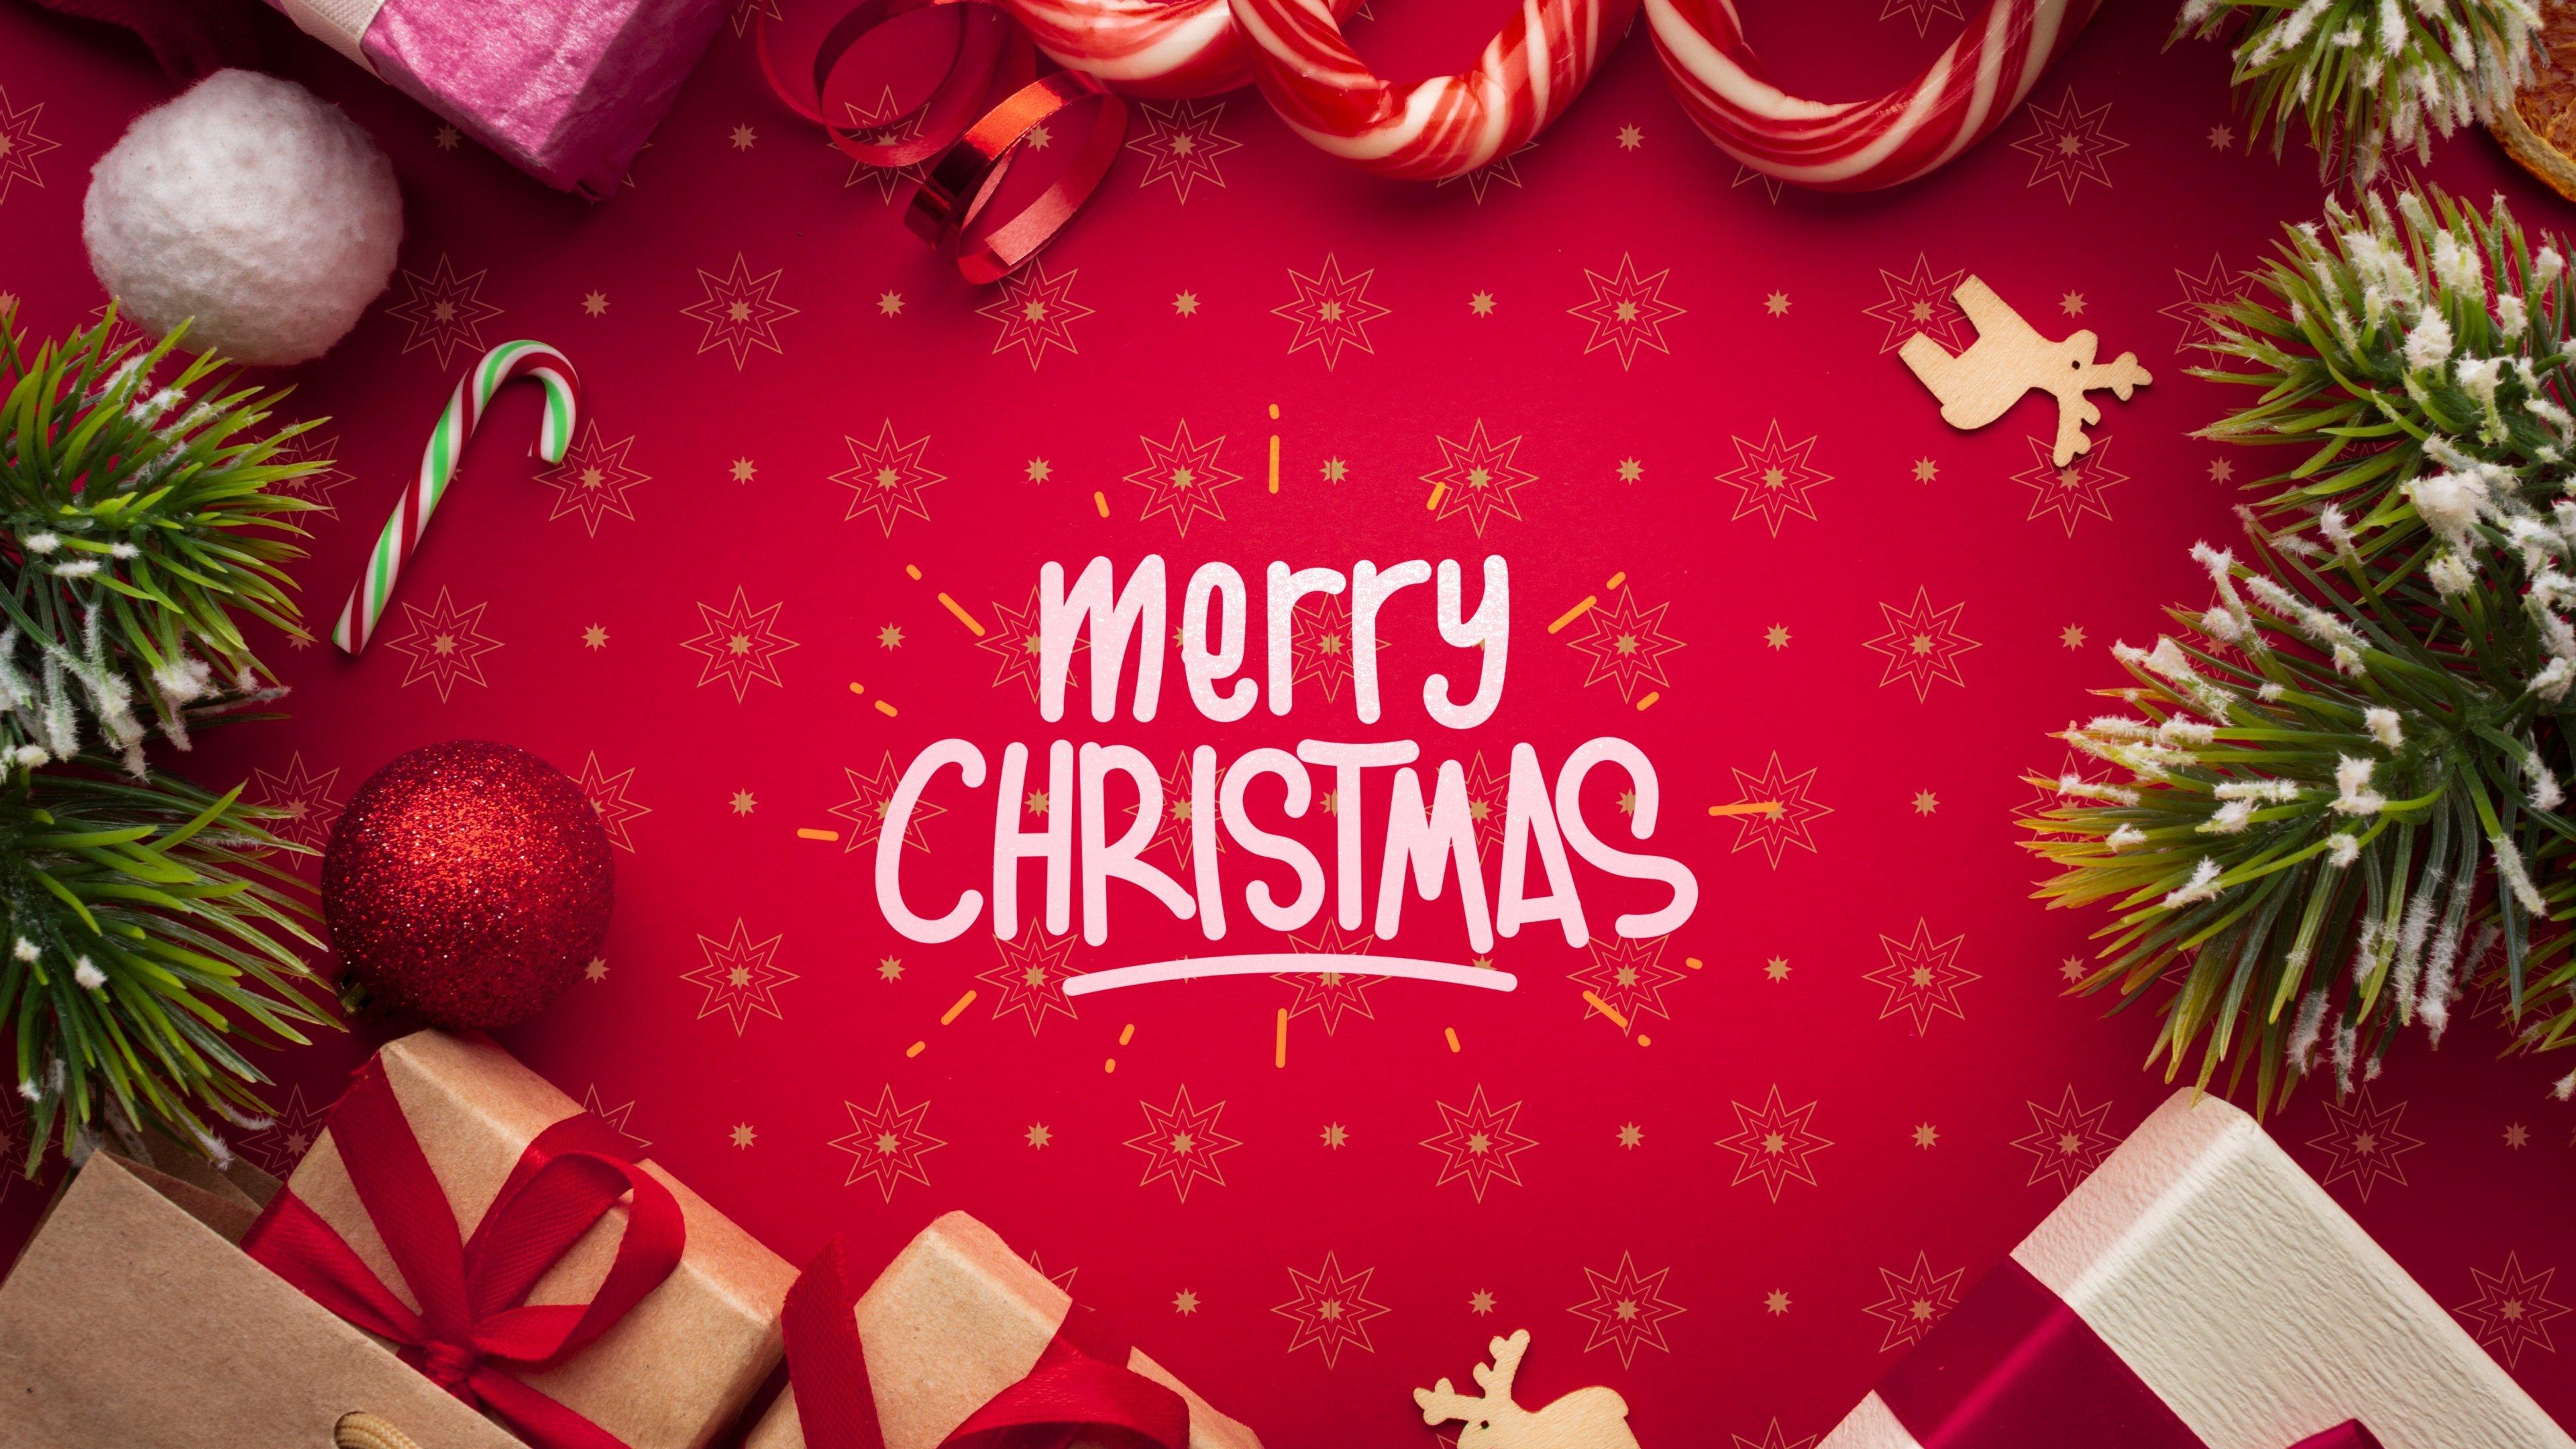 Merry Christmas Wallpaper High Resolution   Image 3840x2160